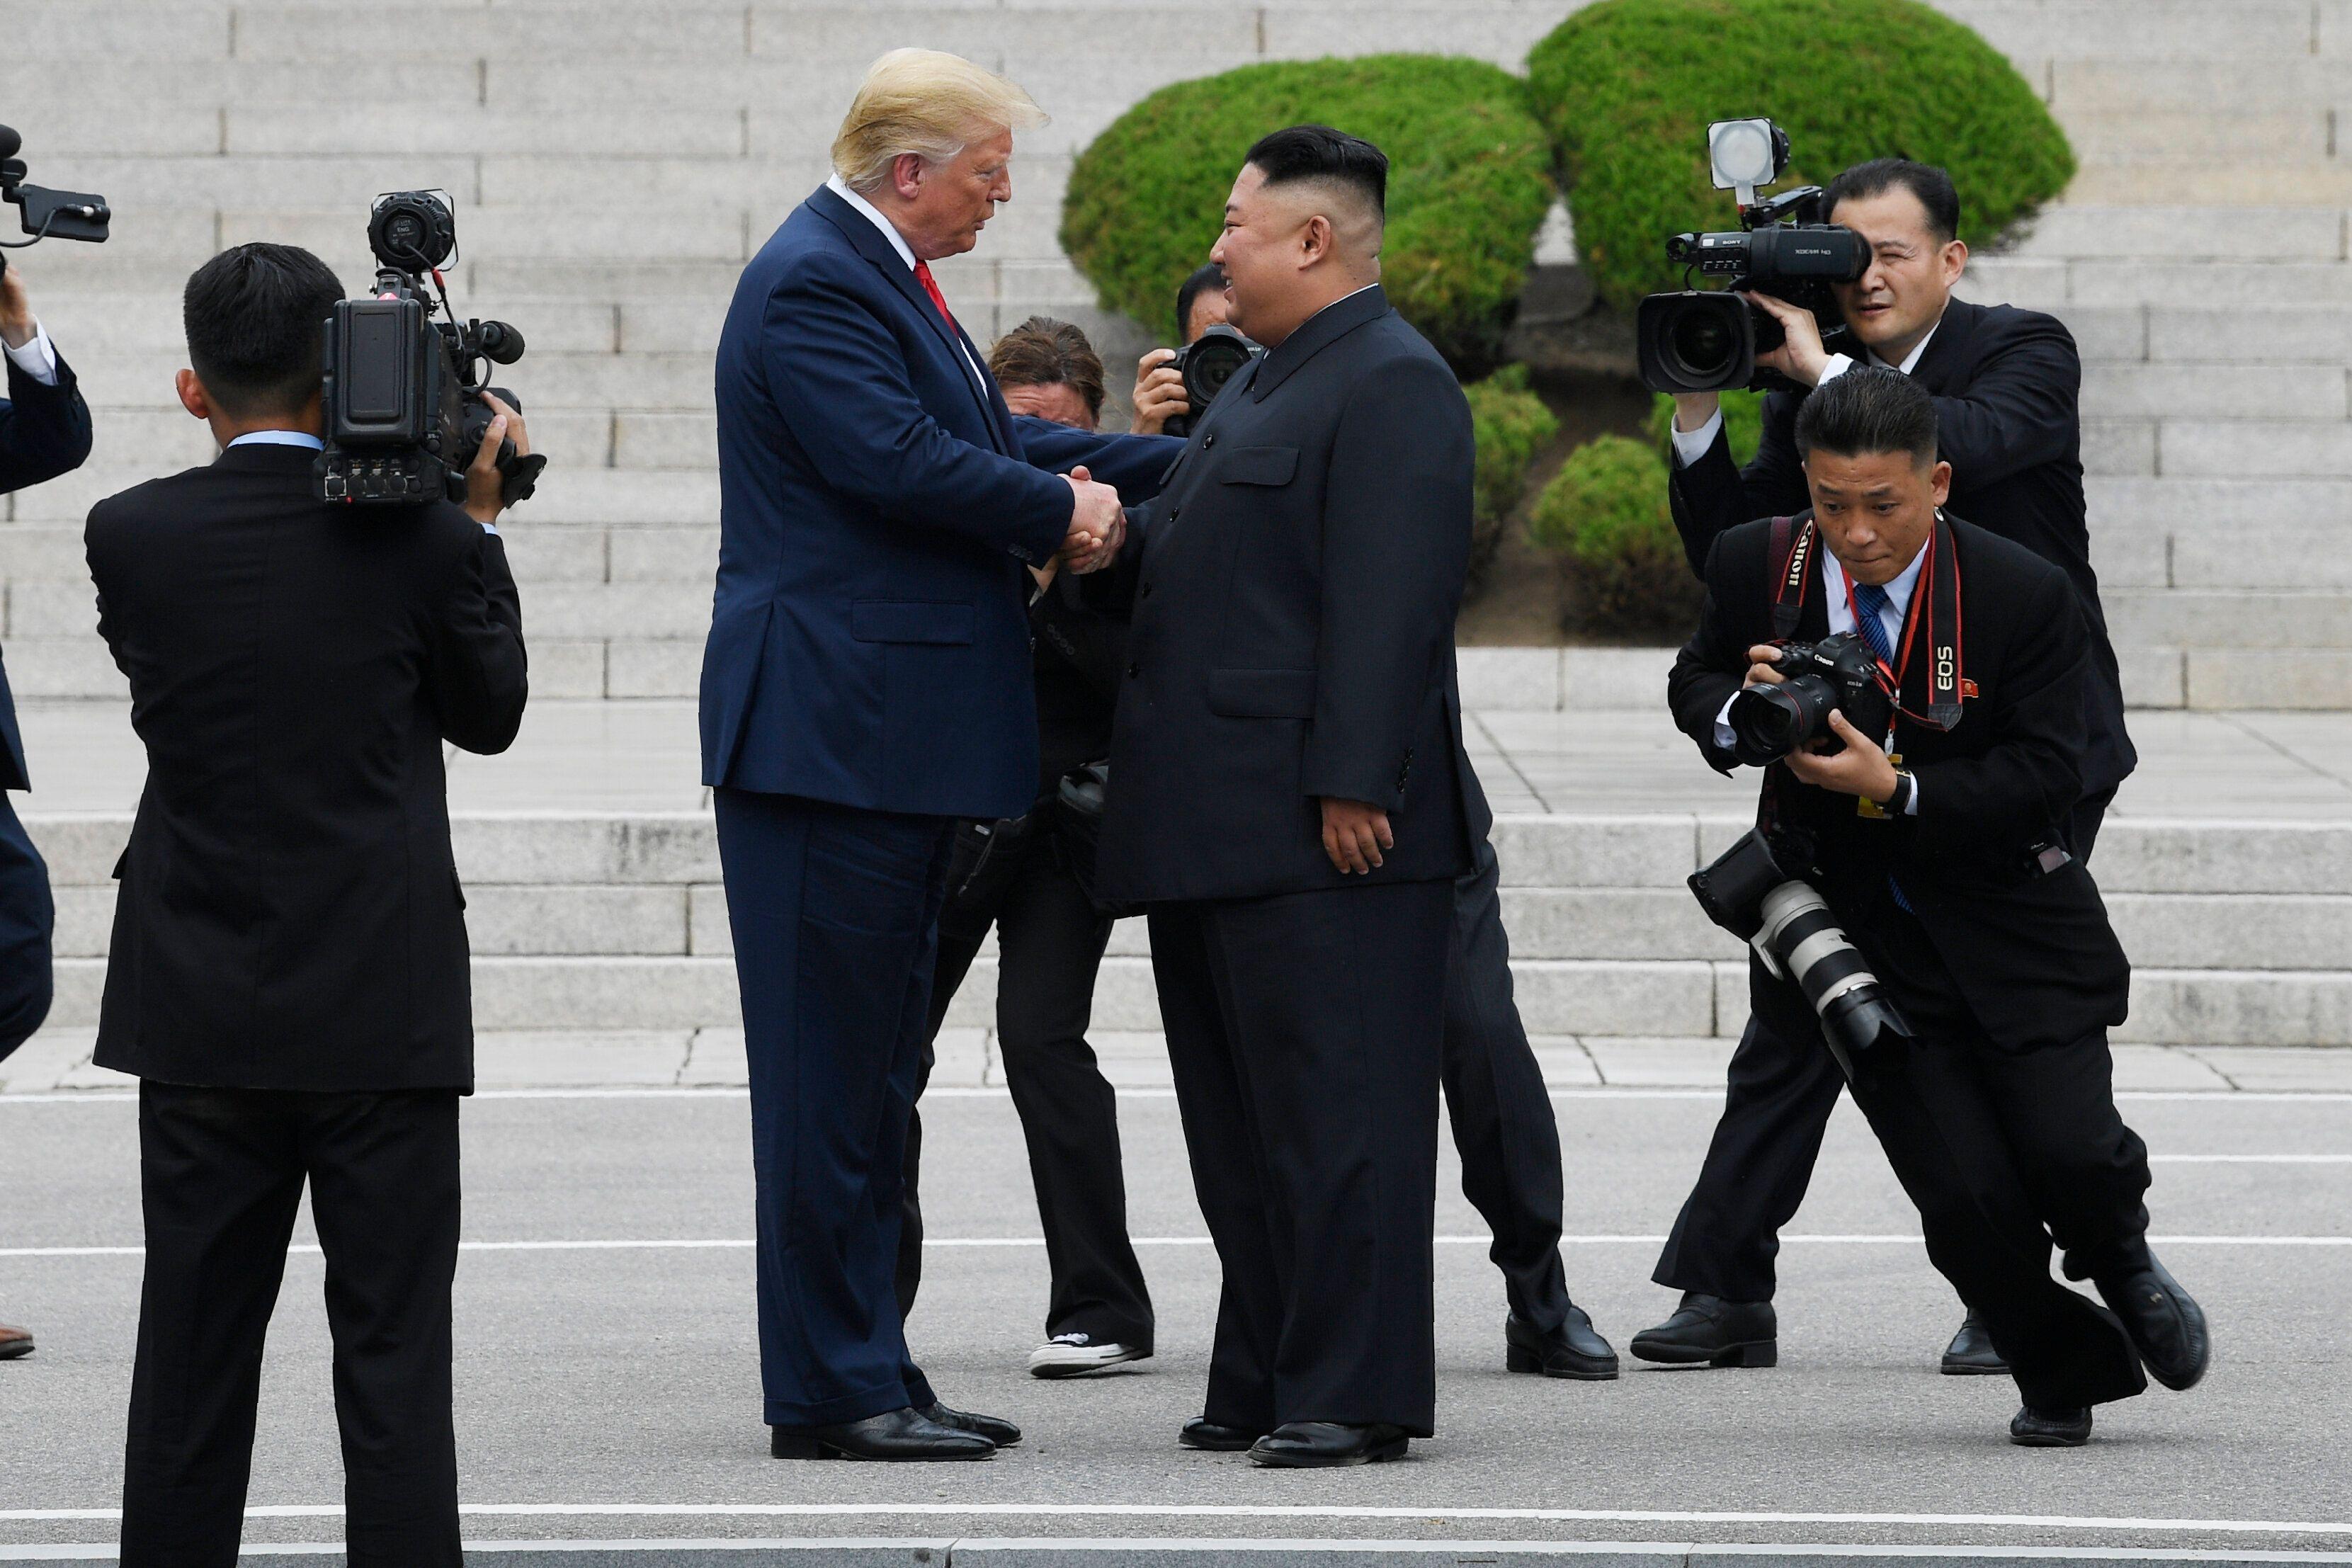 President Donald Trump walks to the North Korean side of the border with North Korean leader Kim Jong Un at the border villag